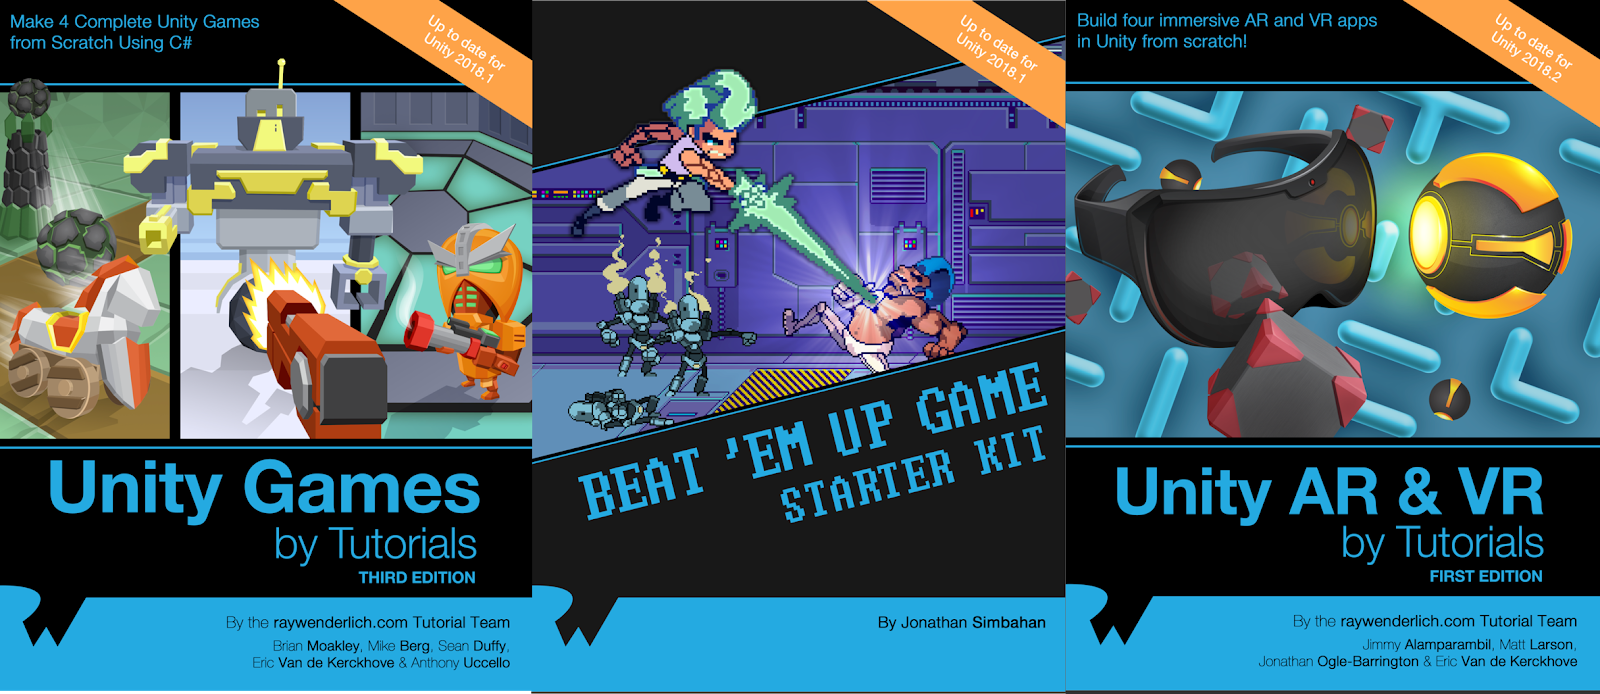 Mega Unity Bundle Ray Wenderlich Books - Programming Ebook